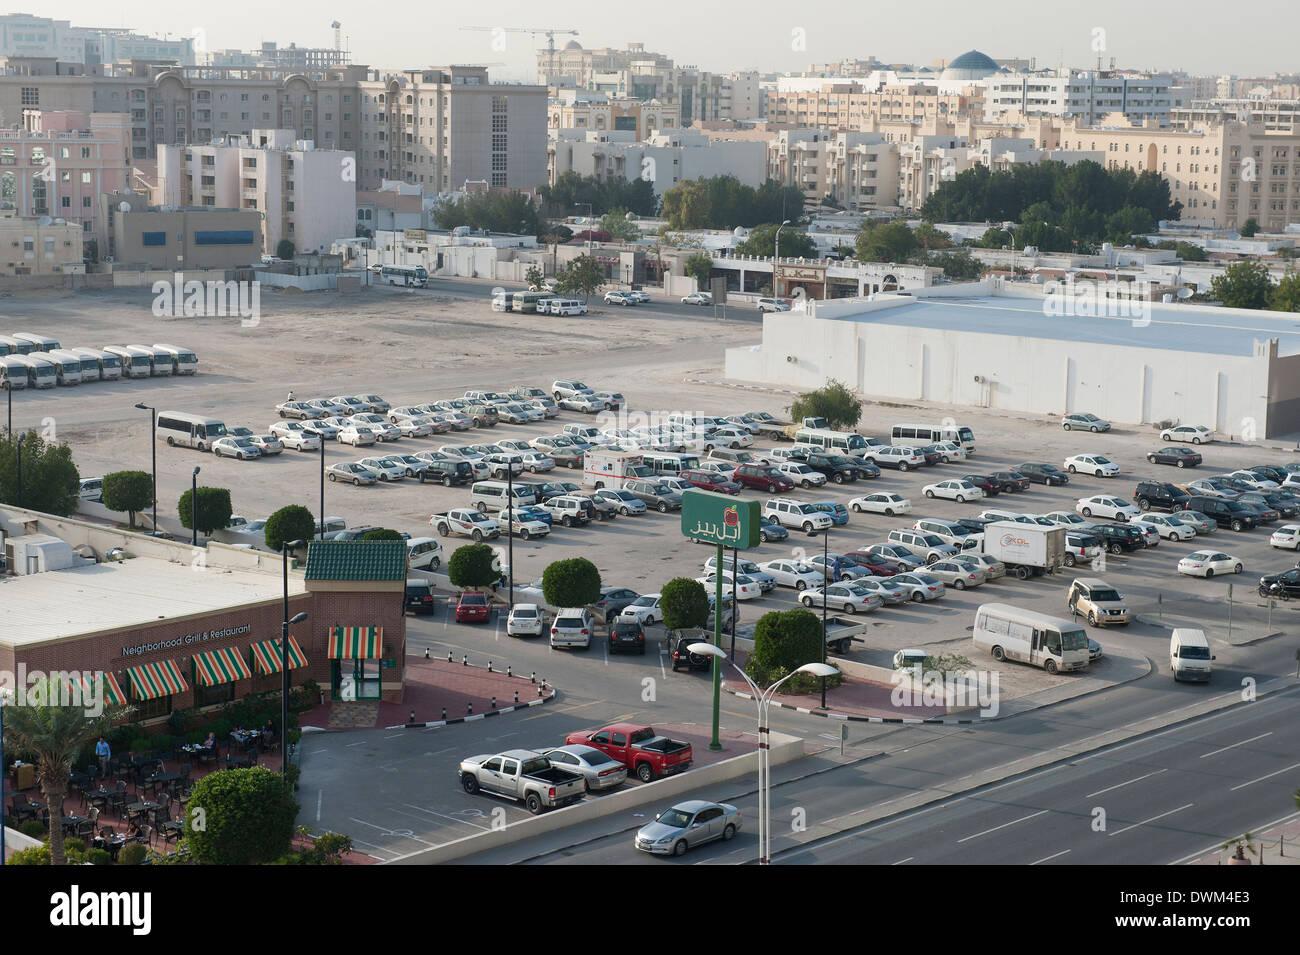 Parking lot and buildings, C Ring Road, Fereej Bin Mahmoud Doha Qatar - Stock Image